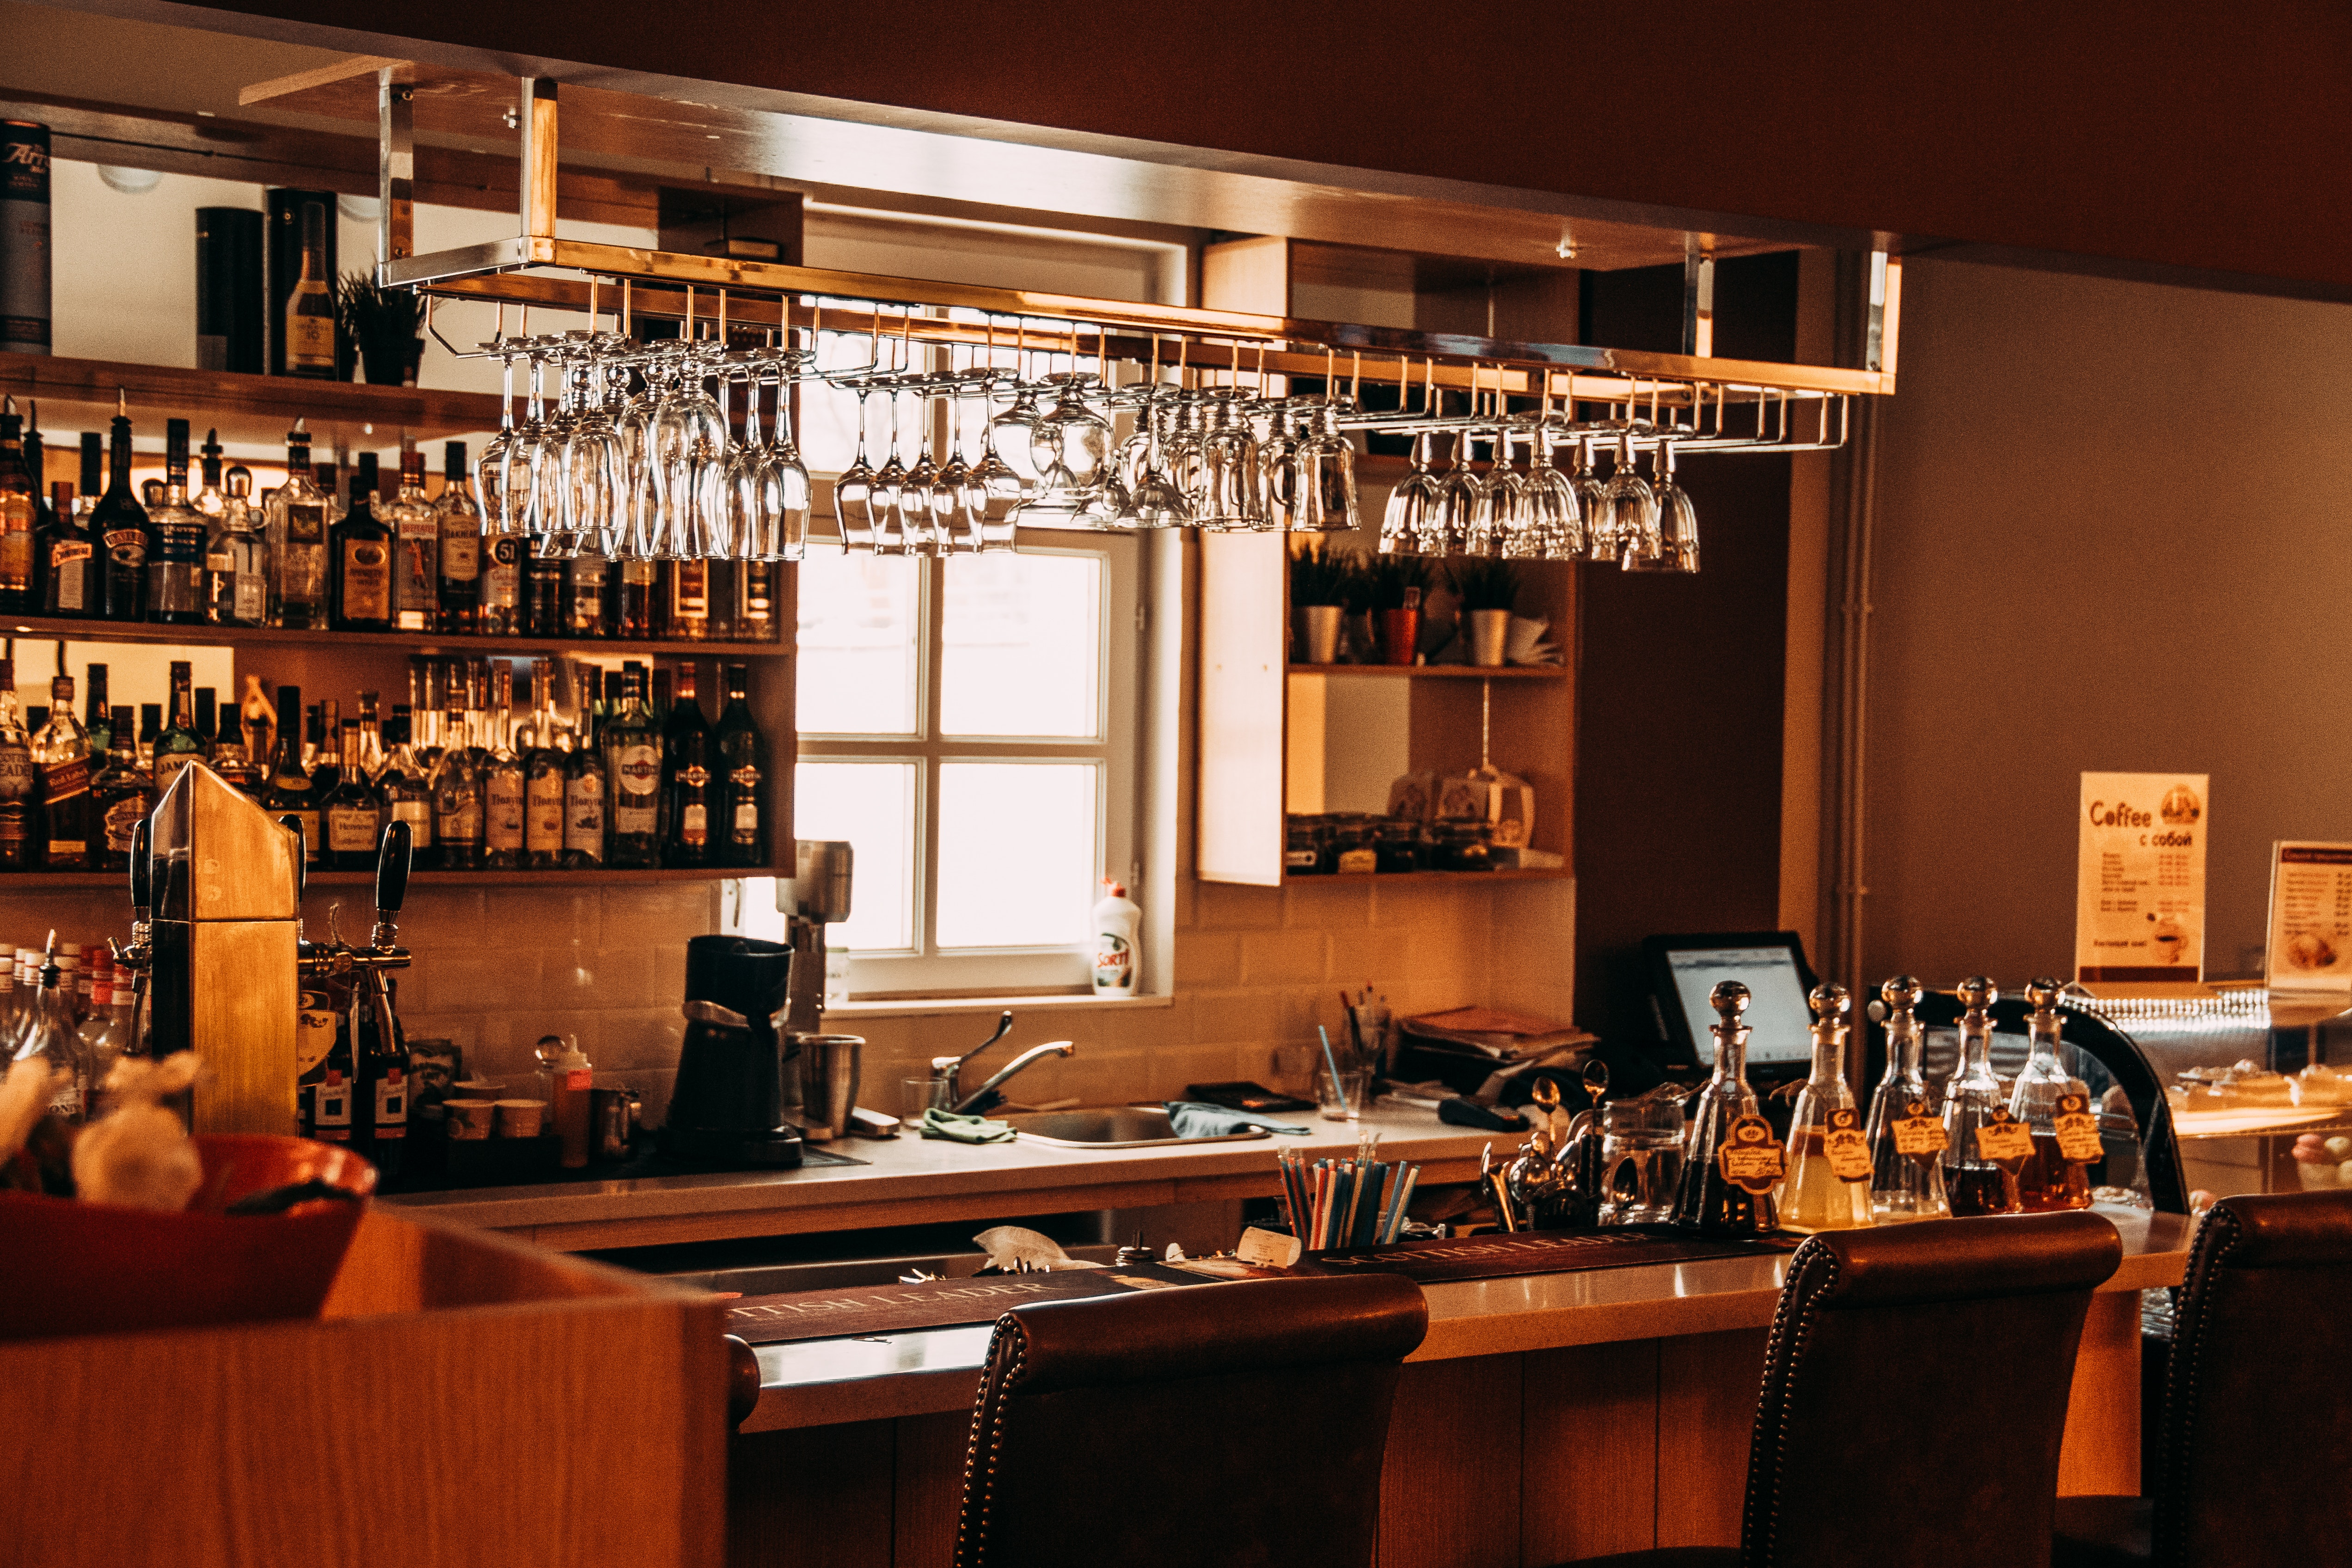 архитектура алкогольный бар фото